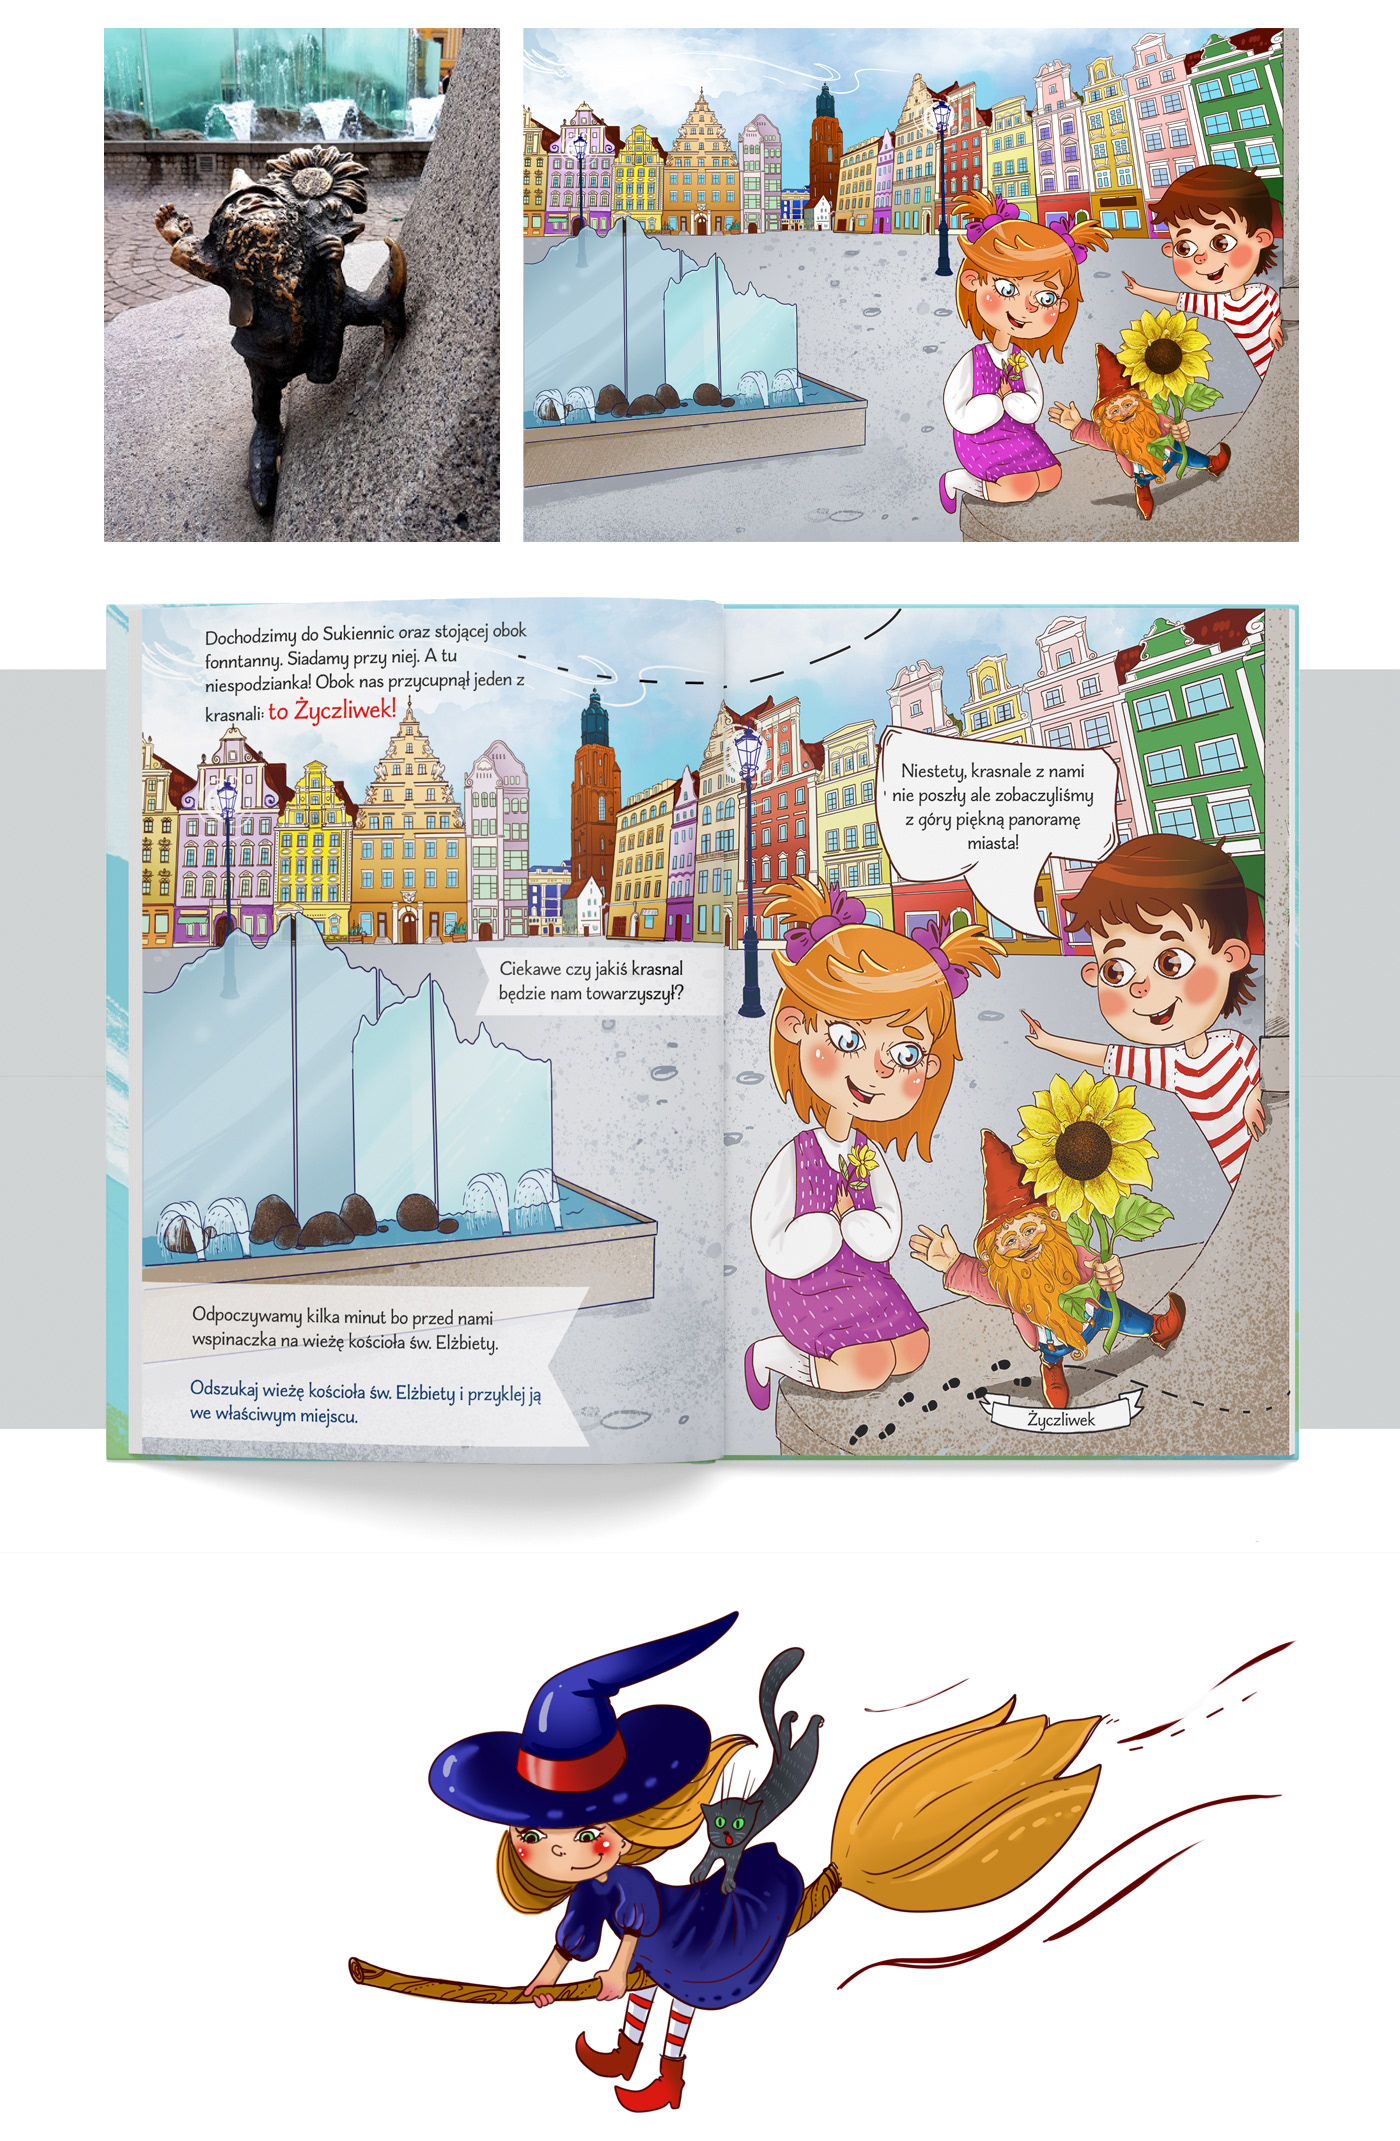 architecture Character design  children children book emka kid Krasnoludki poland Polish illustrator wroclaw